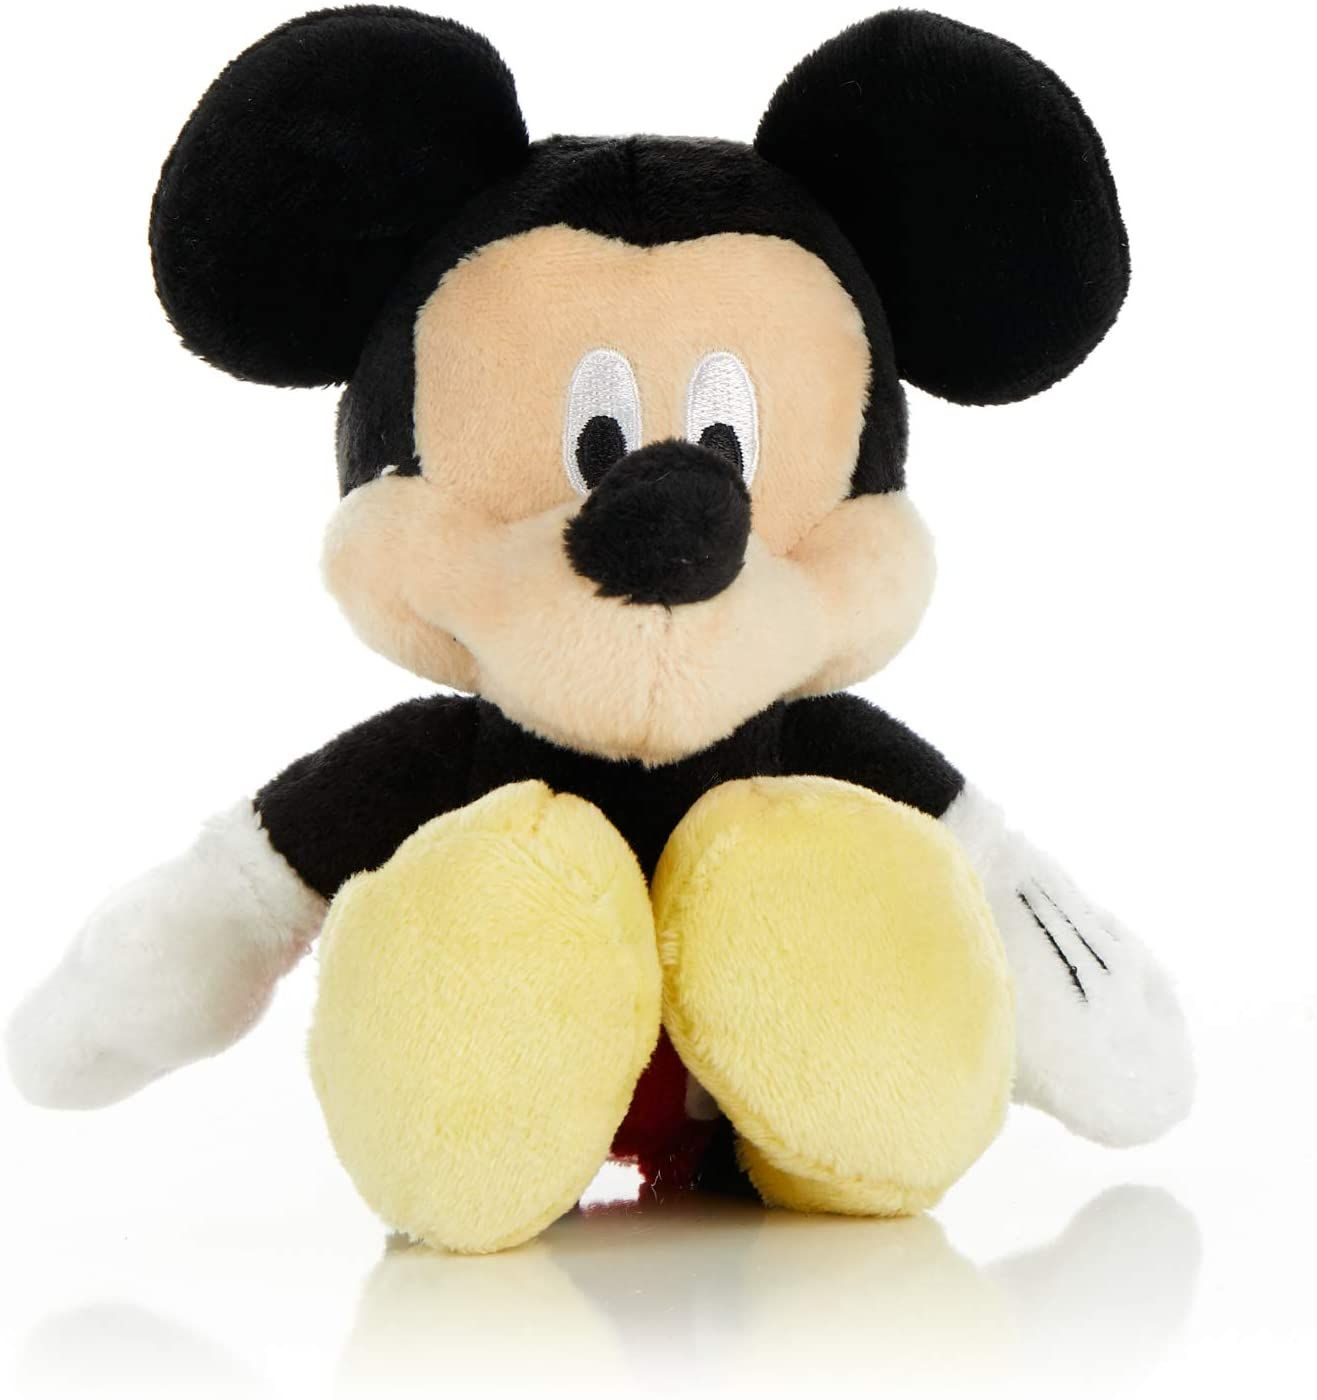 Predownload: Kids Preferred Disney Baby Mickey Mouse Stuffed Animal Plush Toy Mini Jingler 6 5 Inches In 2020 Baby Mickey Animal Plush Toys Baby Disney [ 1400 x 1317 Pixel ]